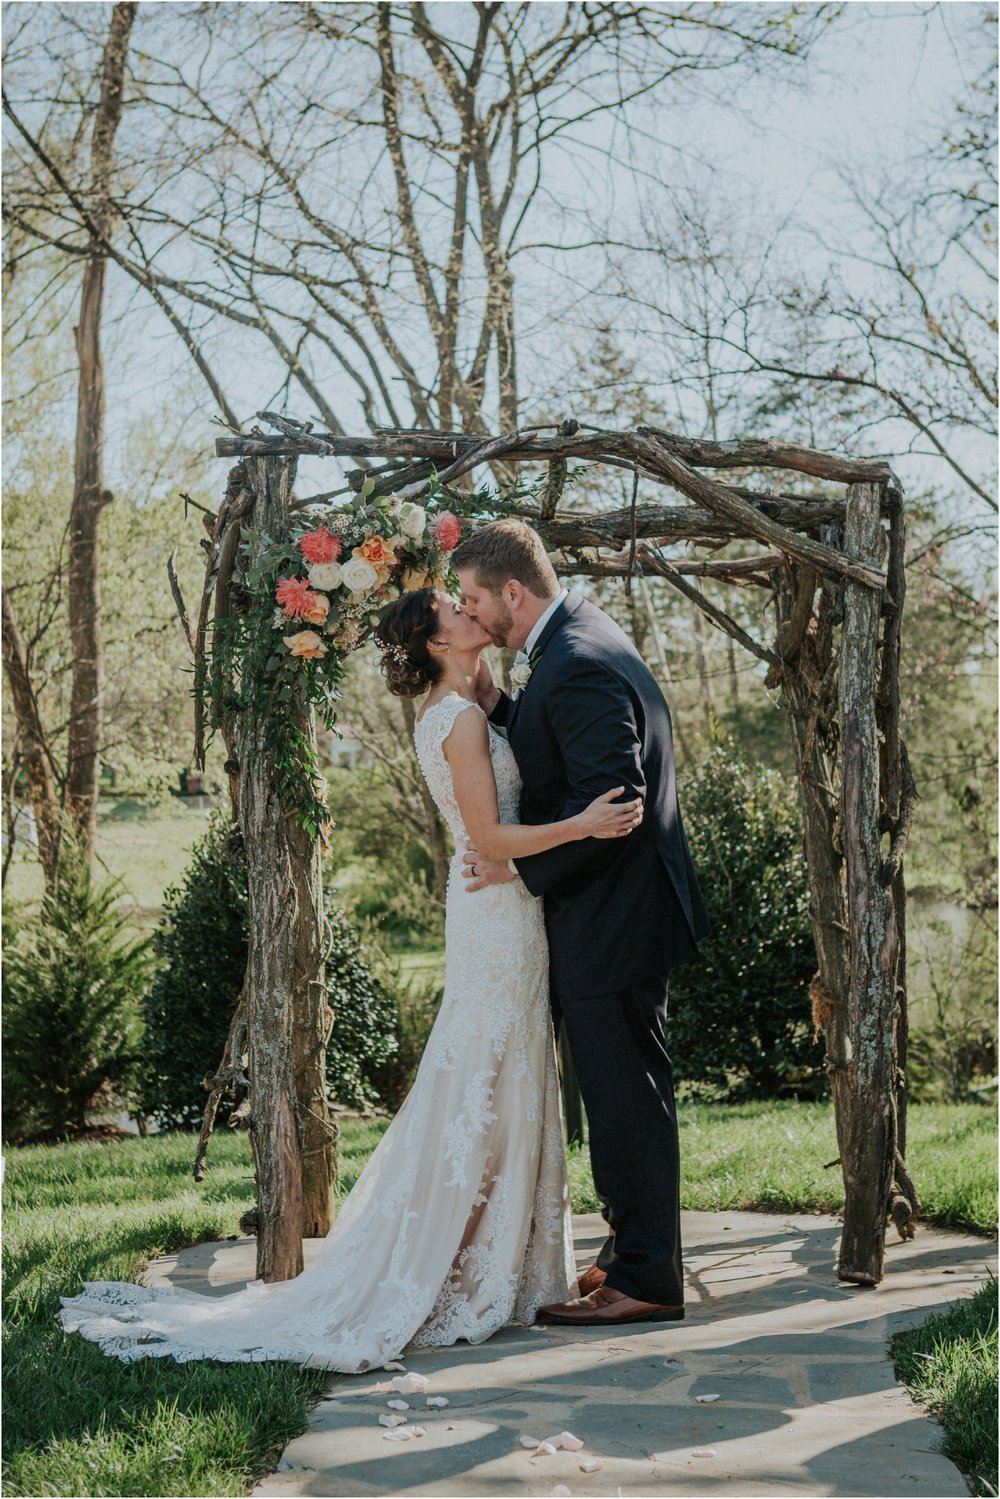 millstone-limestone-tn-tennessee-rustic-outdoors-pastel-lodge-cabin-venue-wedding-katy-sergent-photographer_0107.jpg